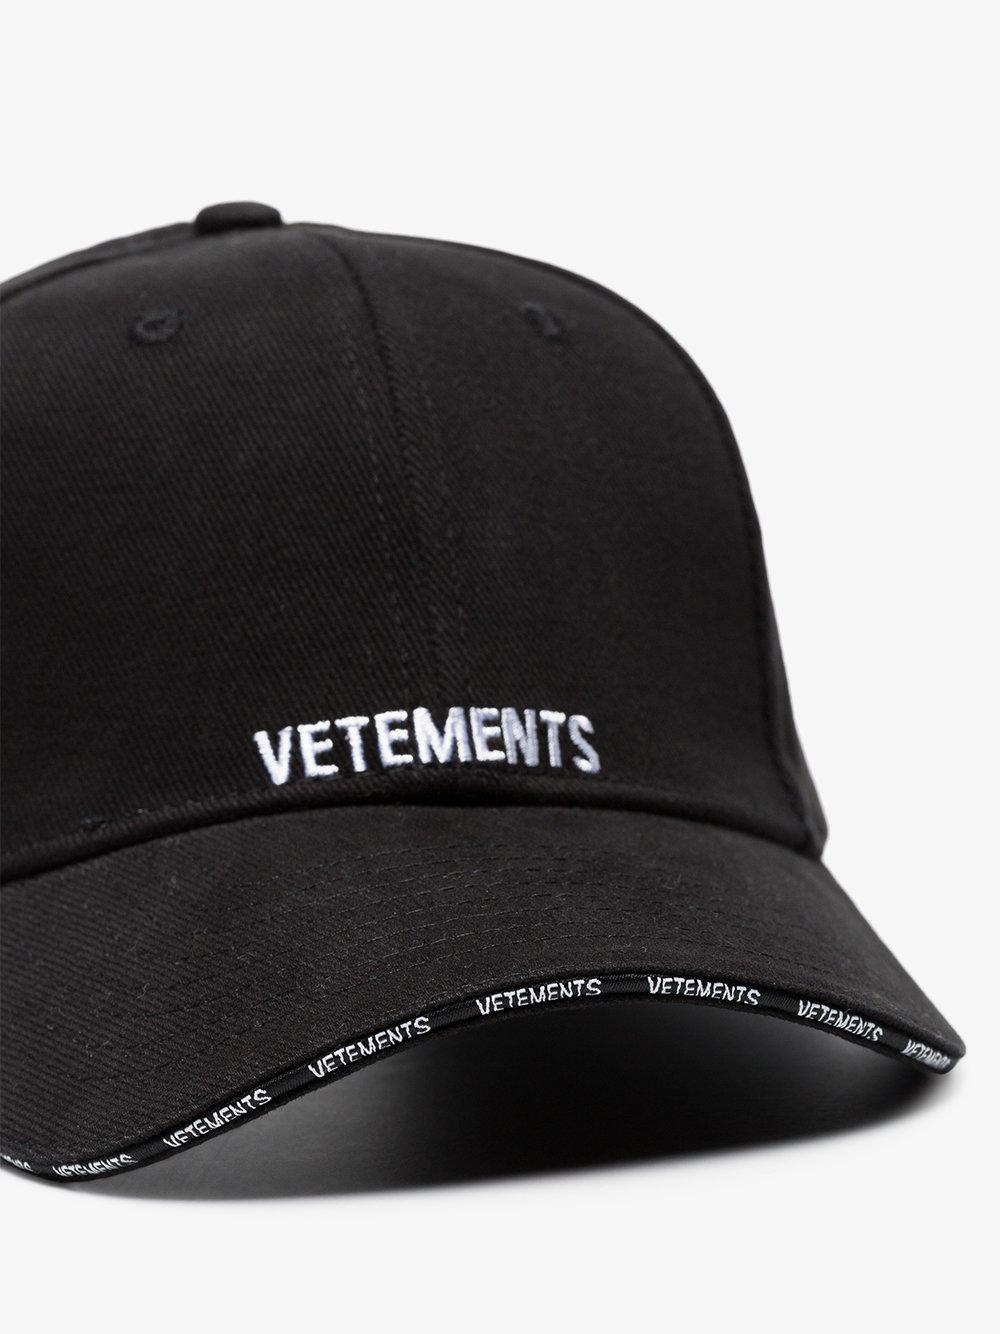 Lyst - Vetements Logo Cap in Black d2c6ba457ac